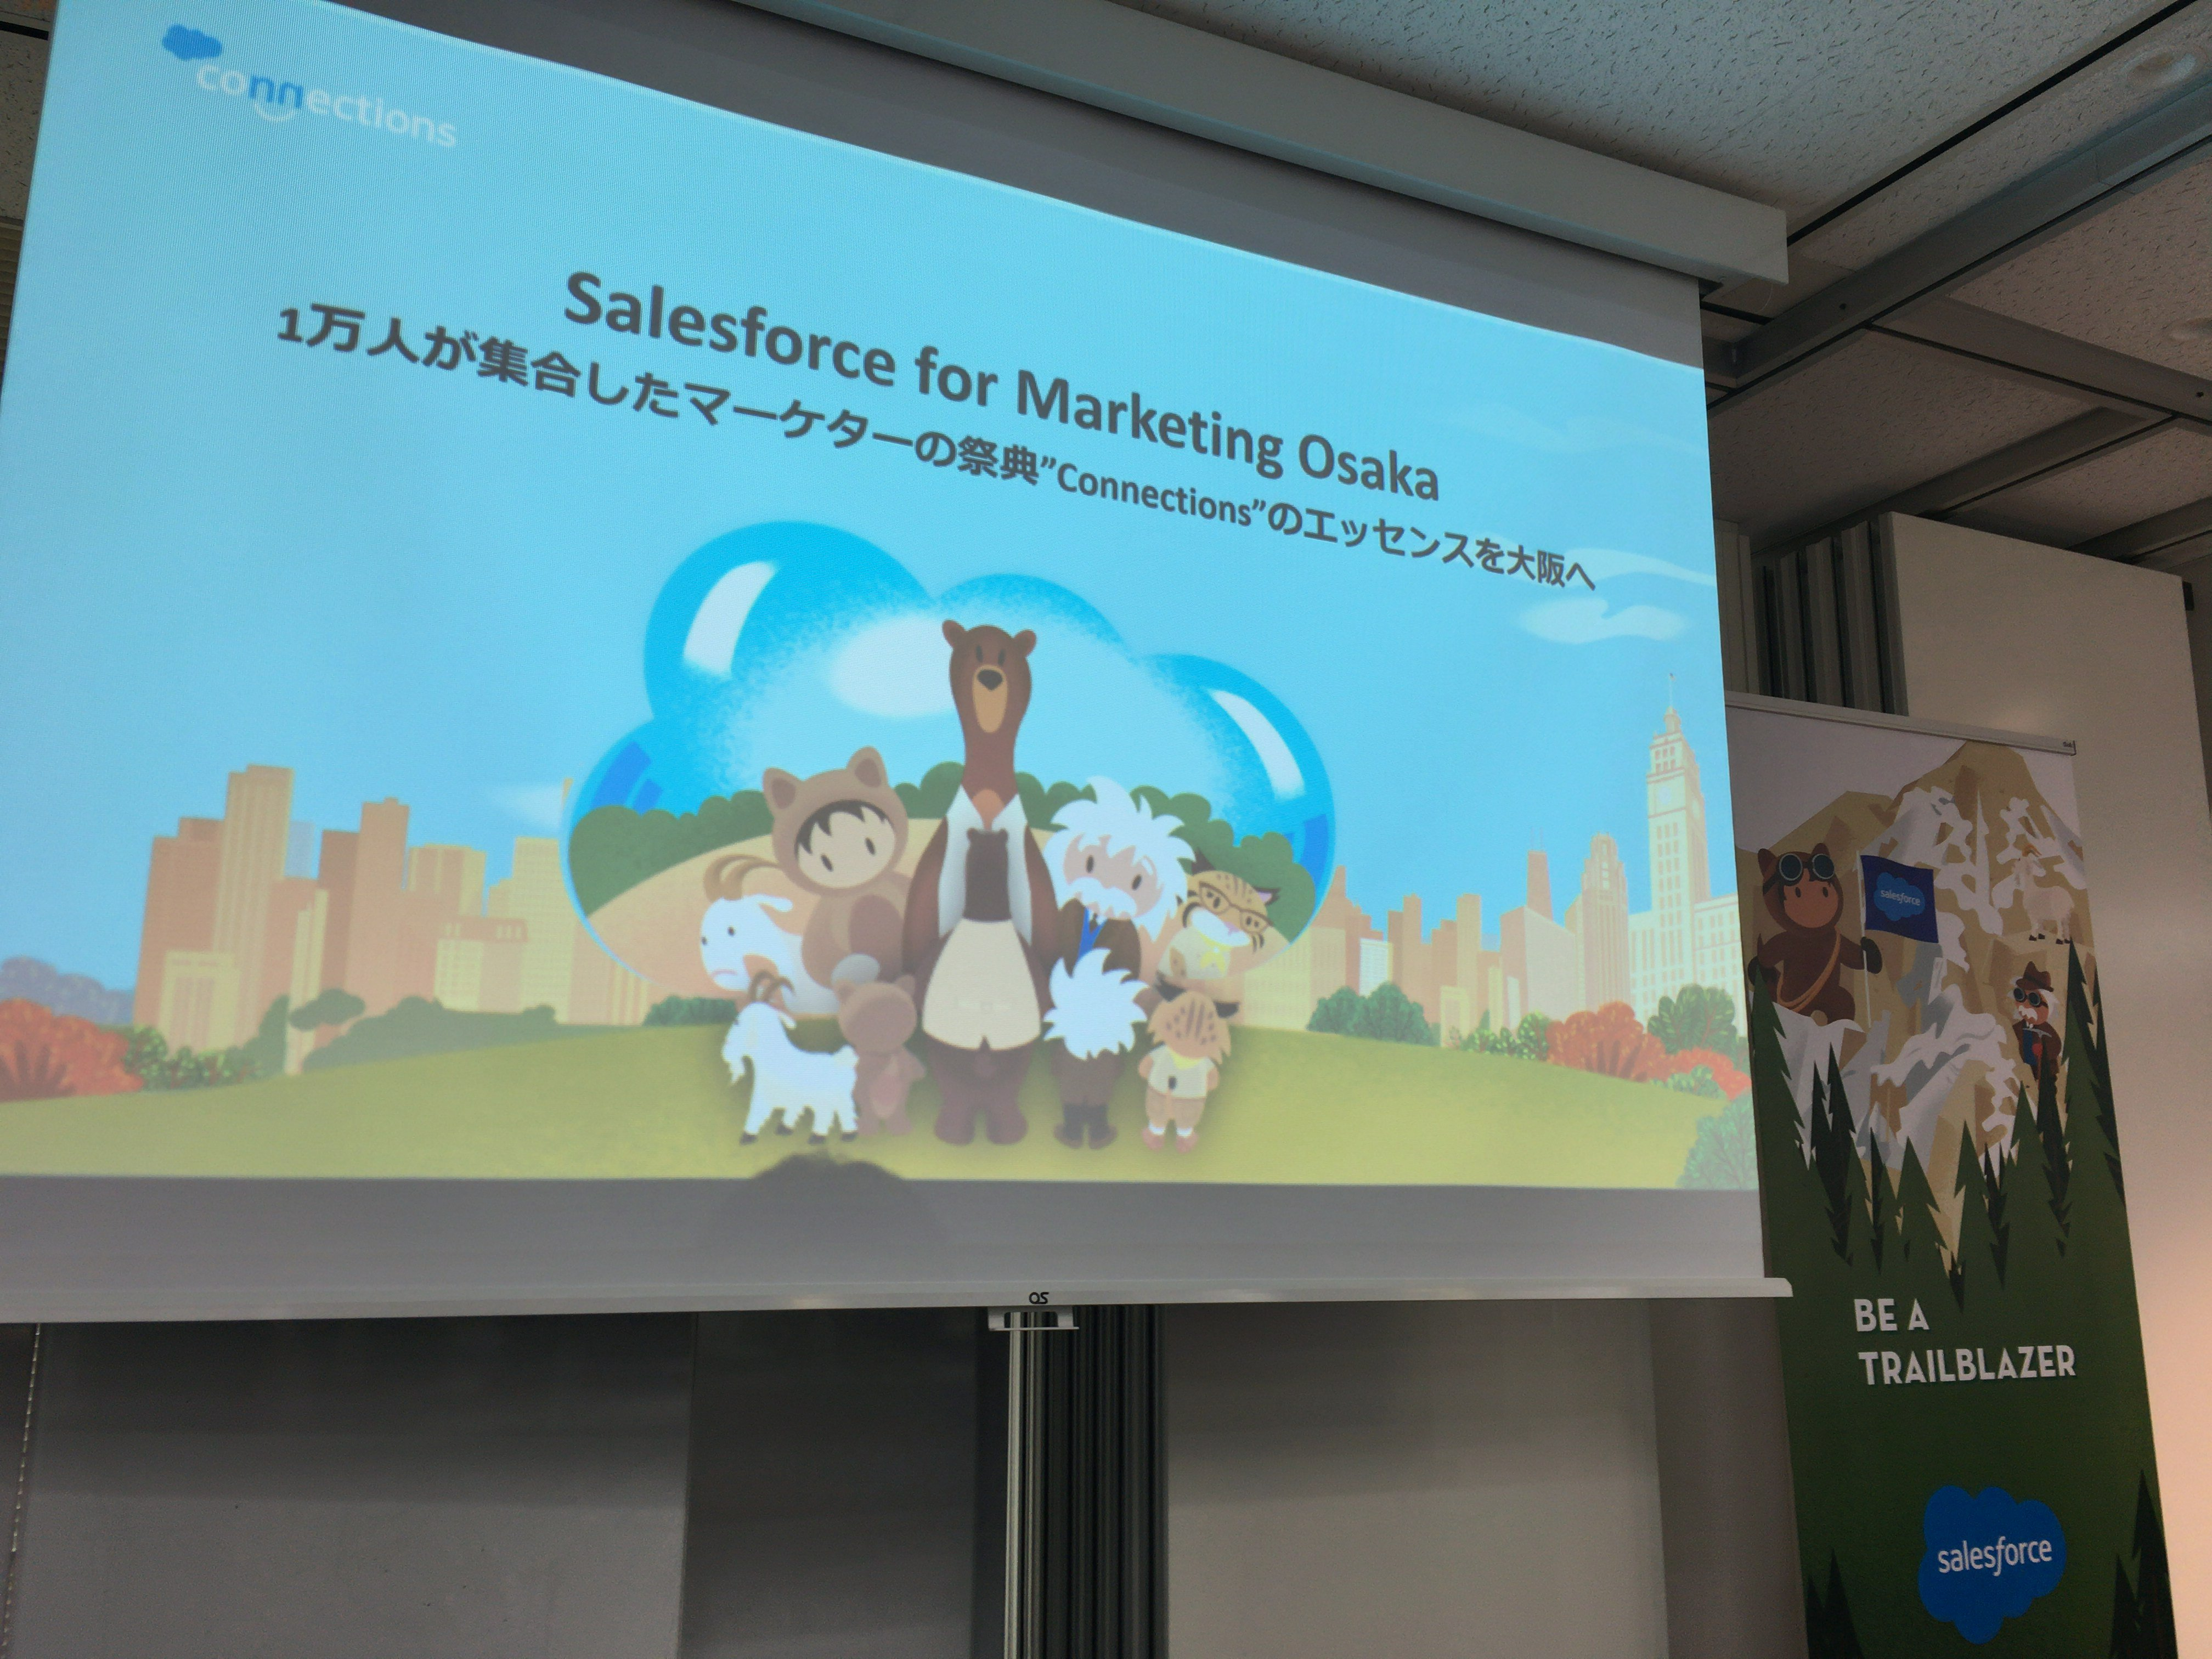 Connectionsの最新エッセンスを大阪でGETしよう!「Salesforce for Marketing Osaka」